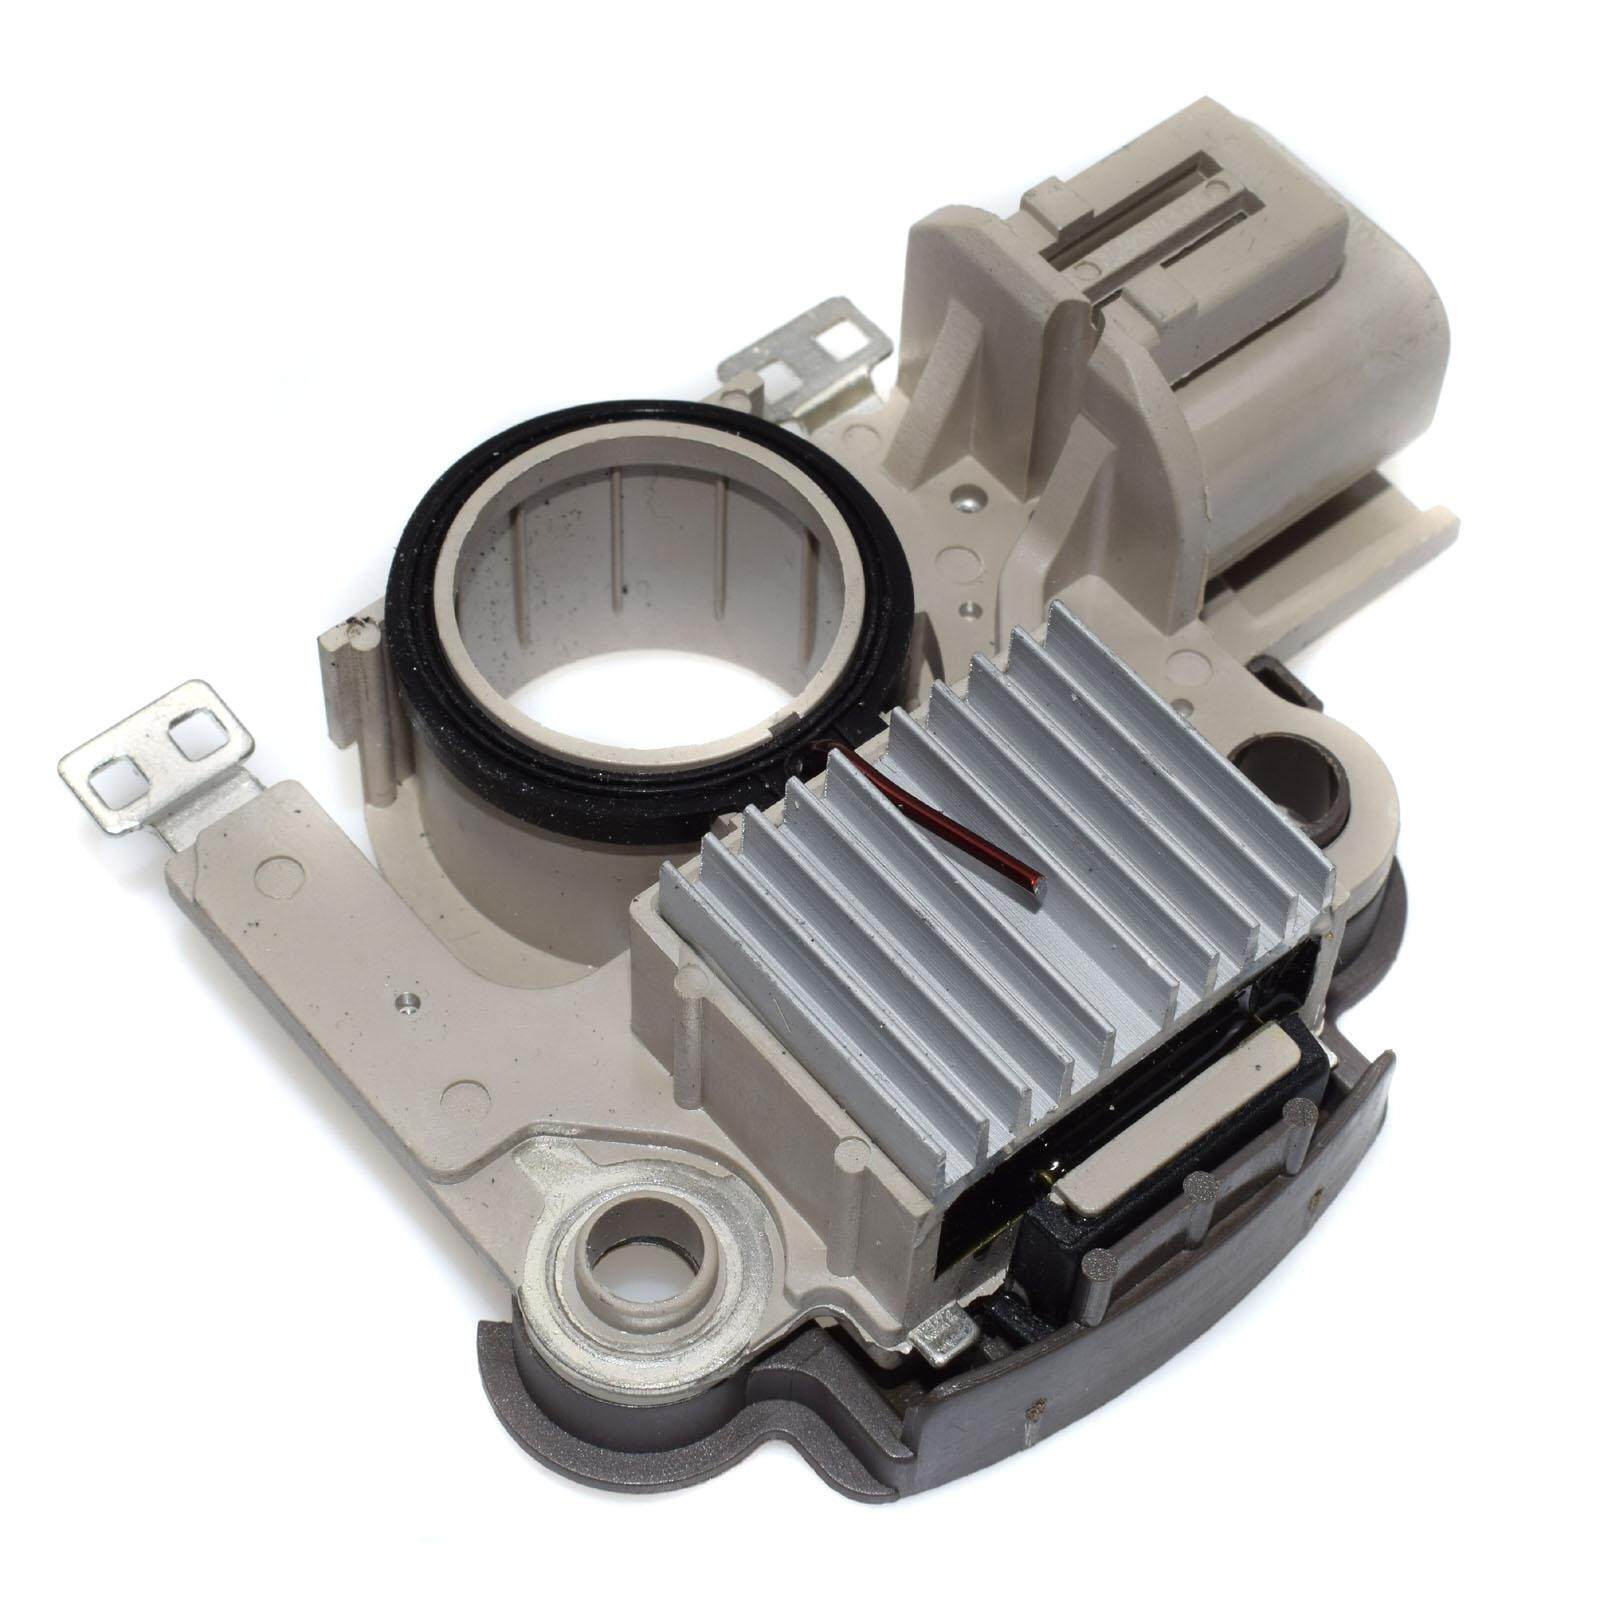 Voltage Regulators For Sale Car Engine Online Brands Denso Mini Alternator Wiring Chevy New Regulator B64j 18 300b A866x20472 Mazda 626 Mk V Mx